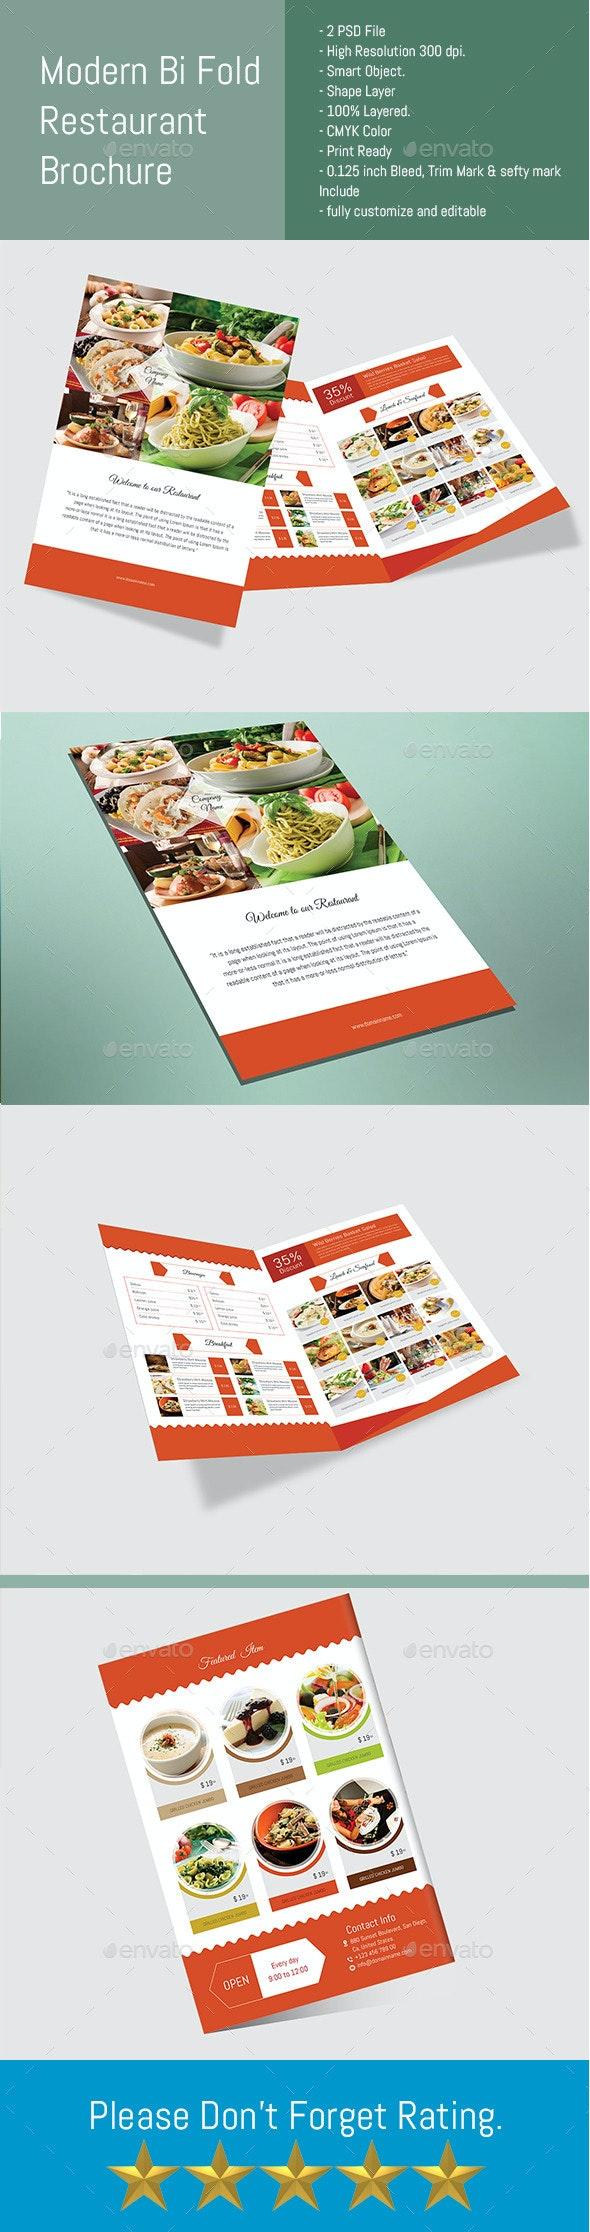 Modern Bi Fold Restaurant Brochure - Brochures Print Templates